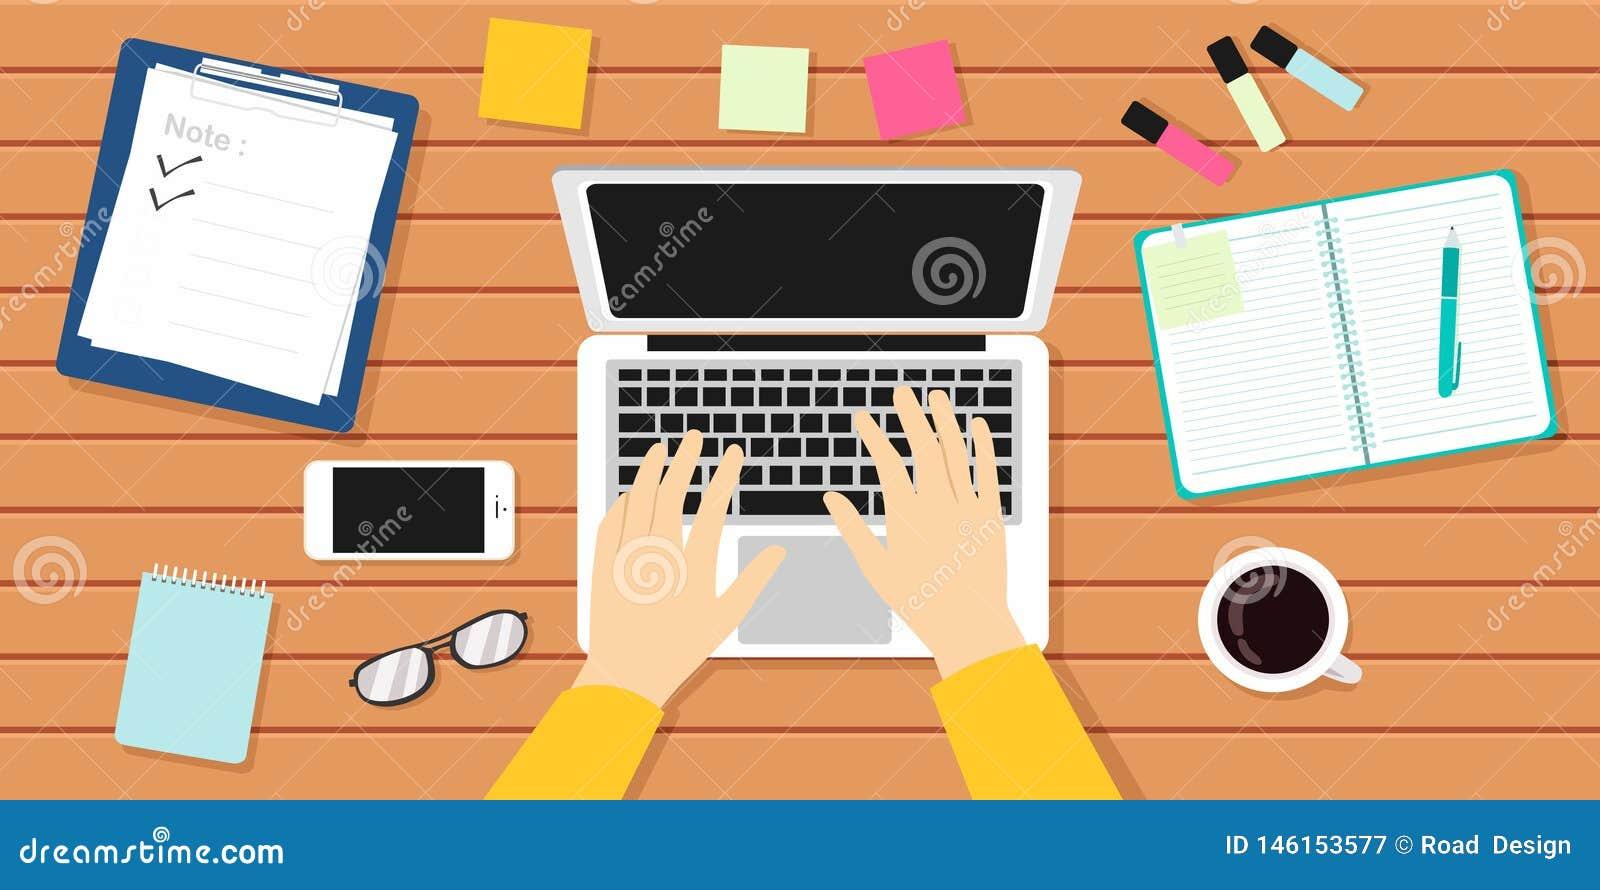 Writer Workplace Vector Illustration. Author, Journalist, Laptop